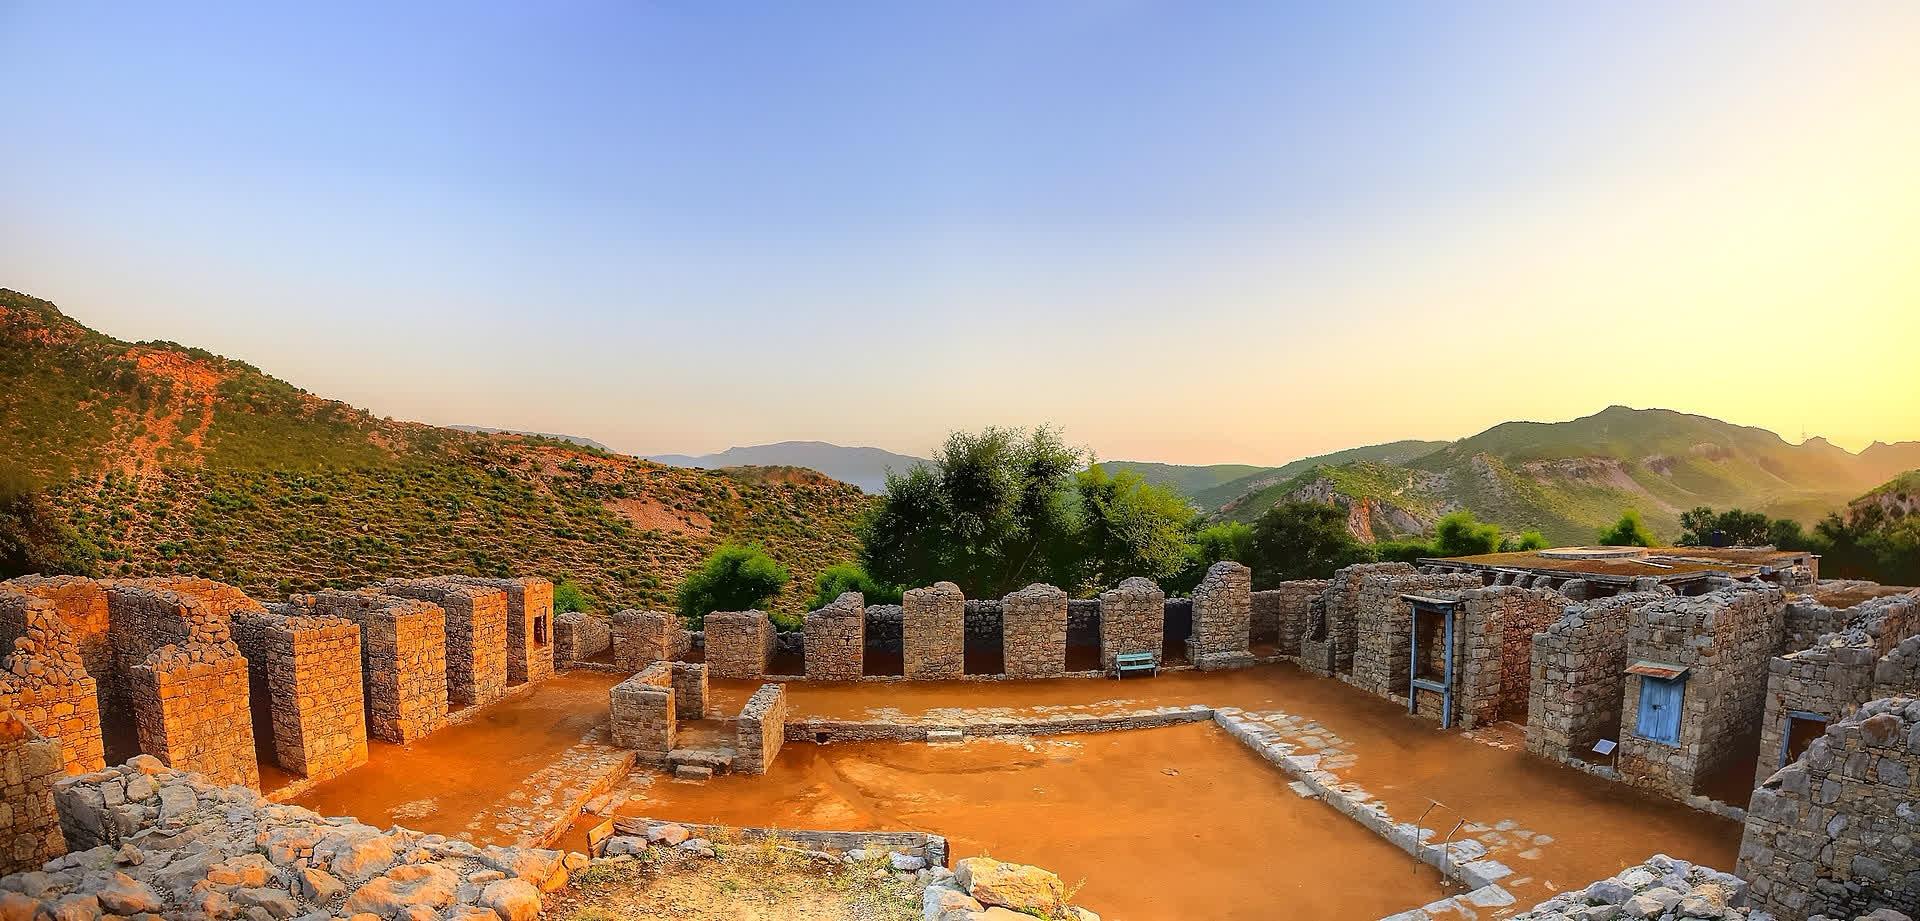 Jaulian monastery